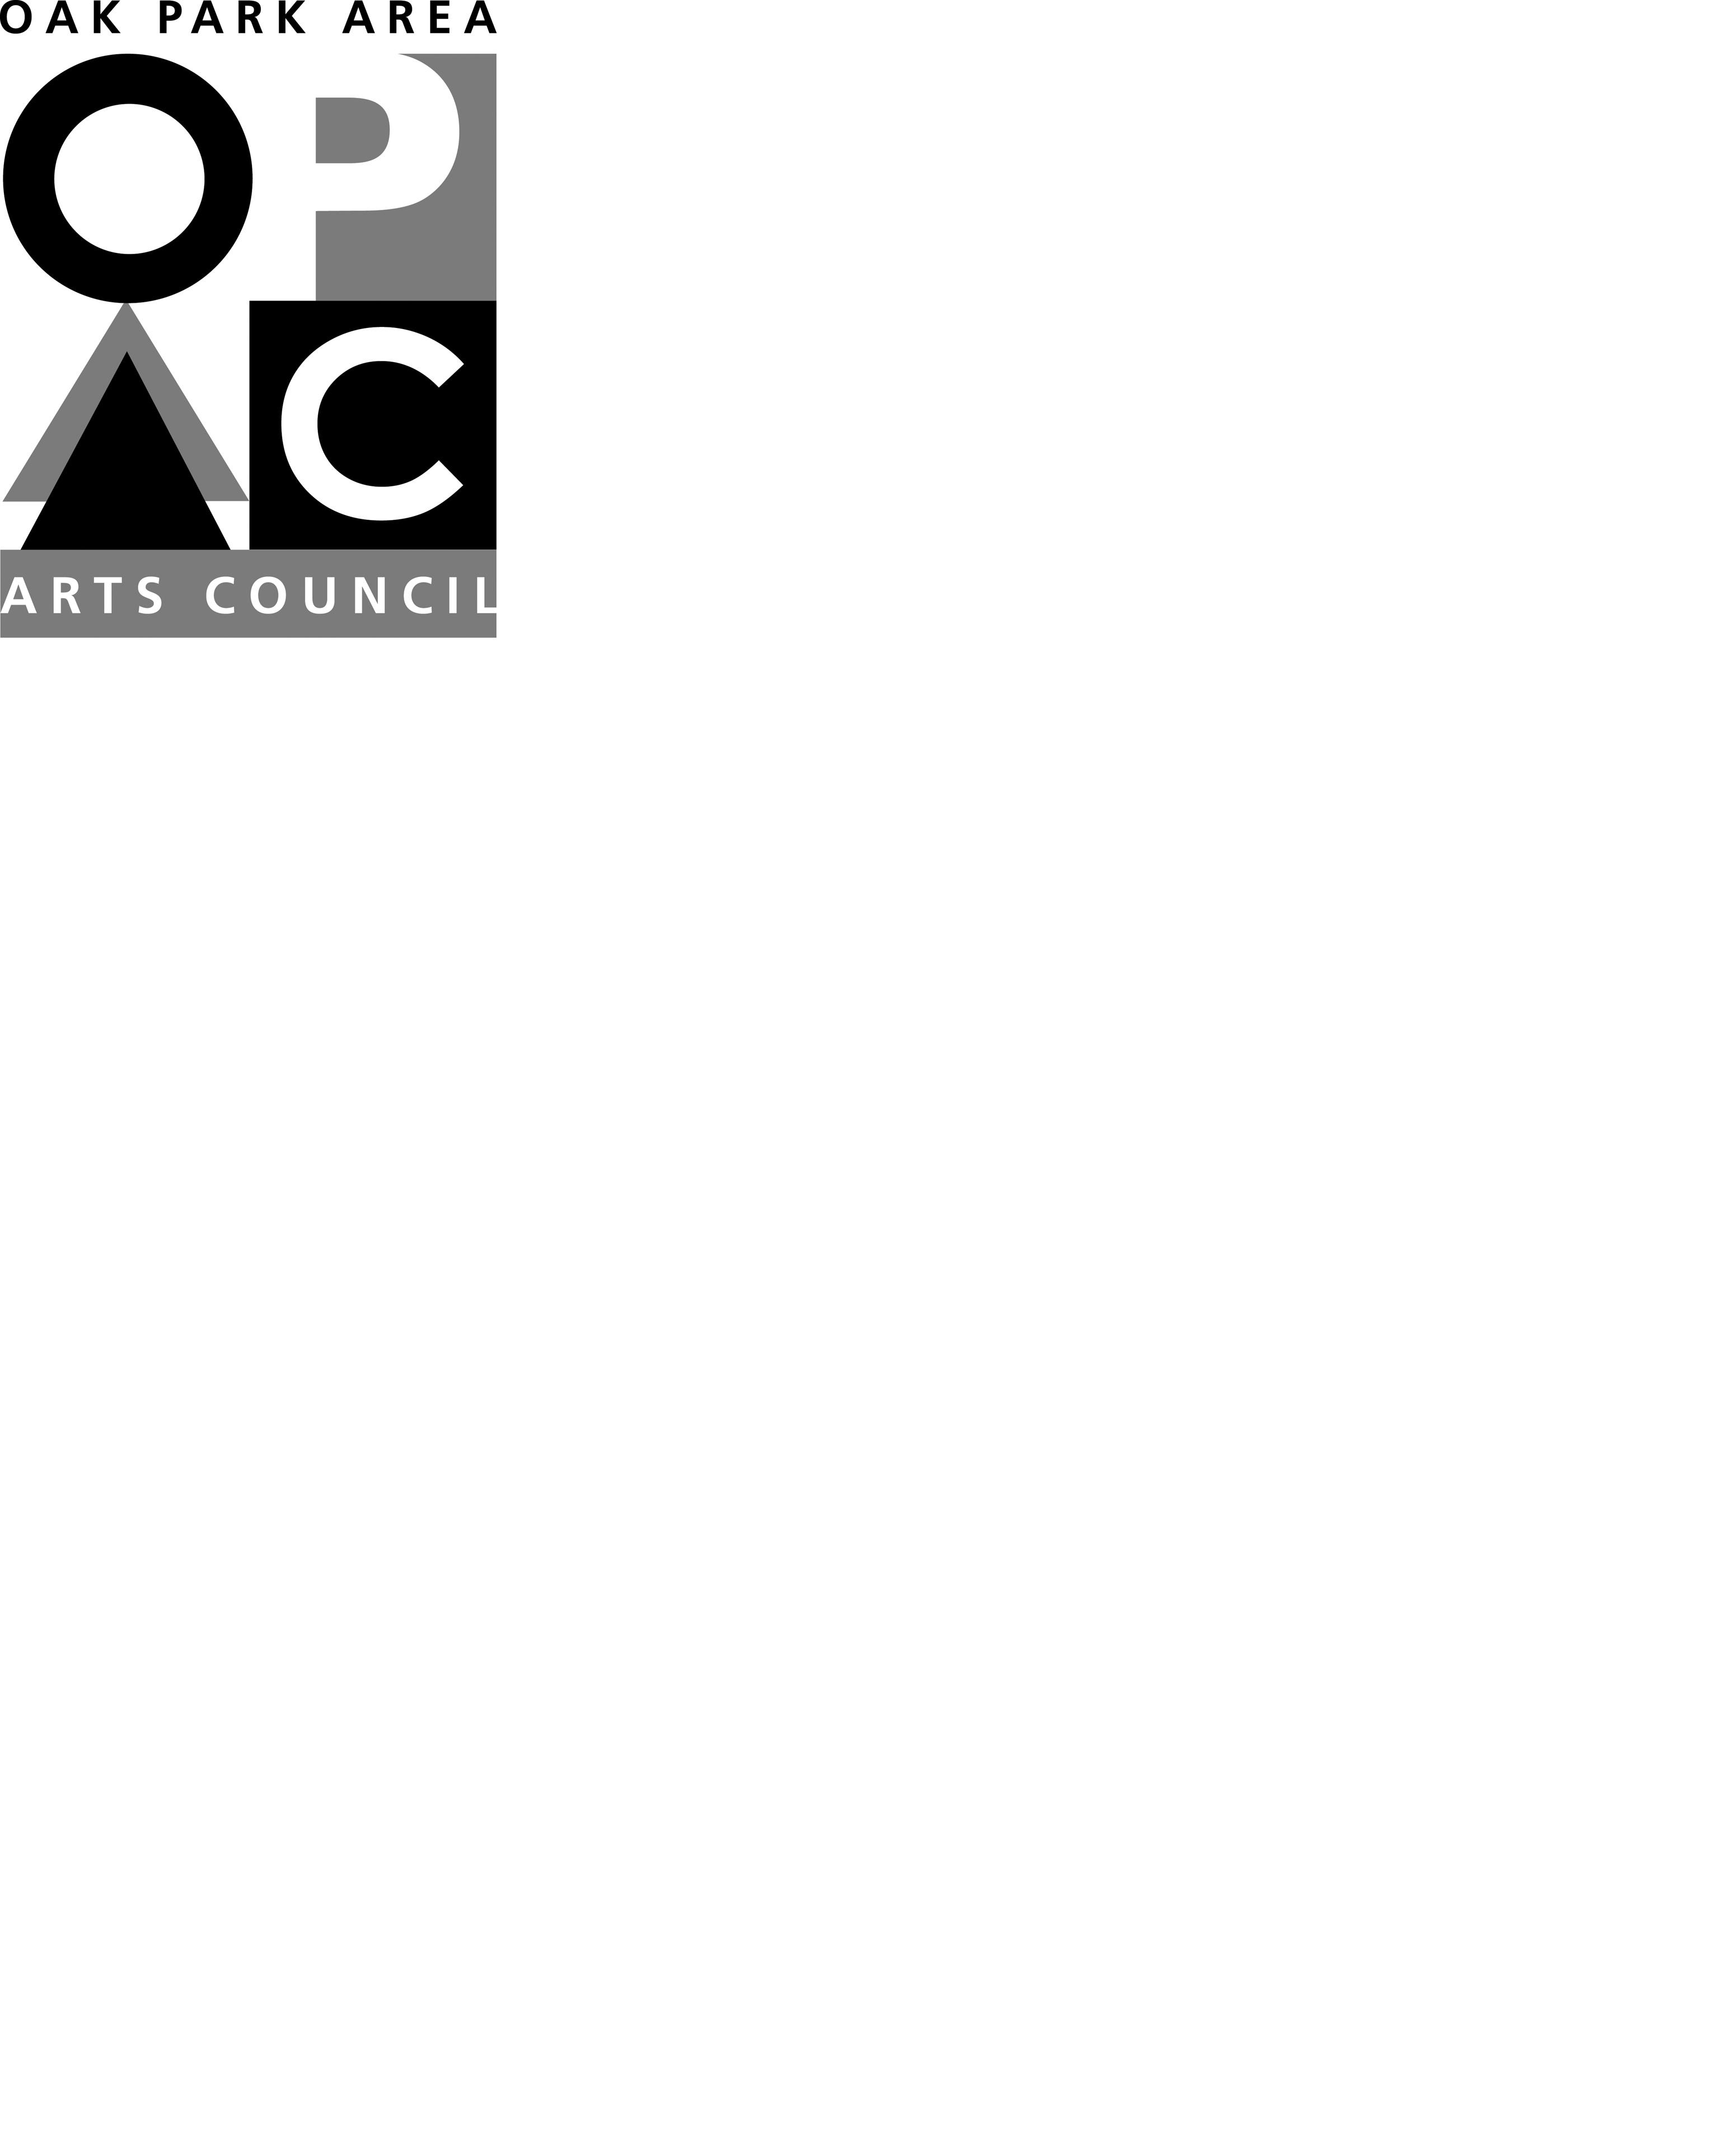 Oak Park Arts Council